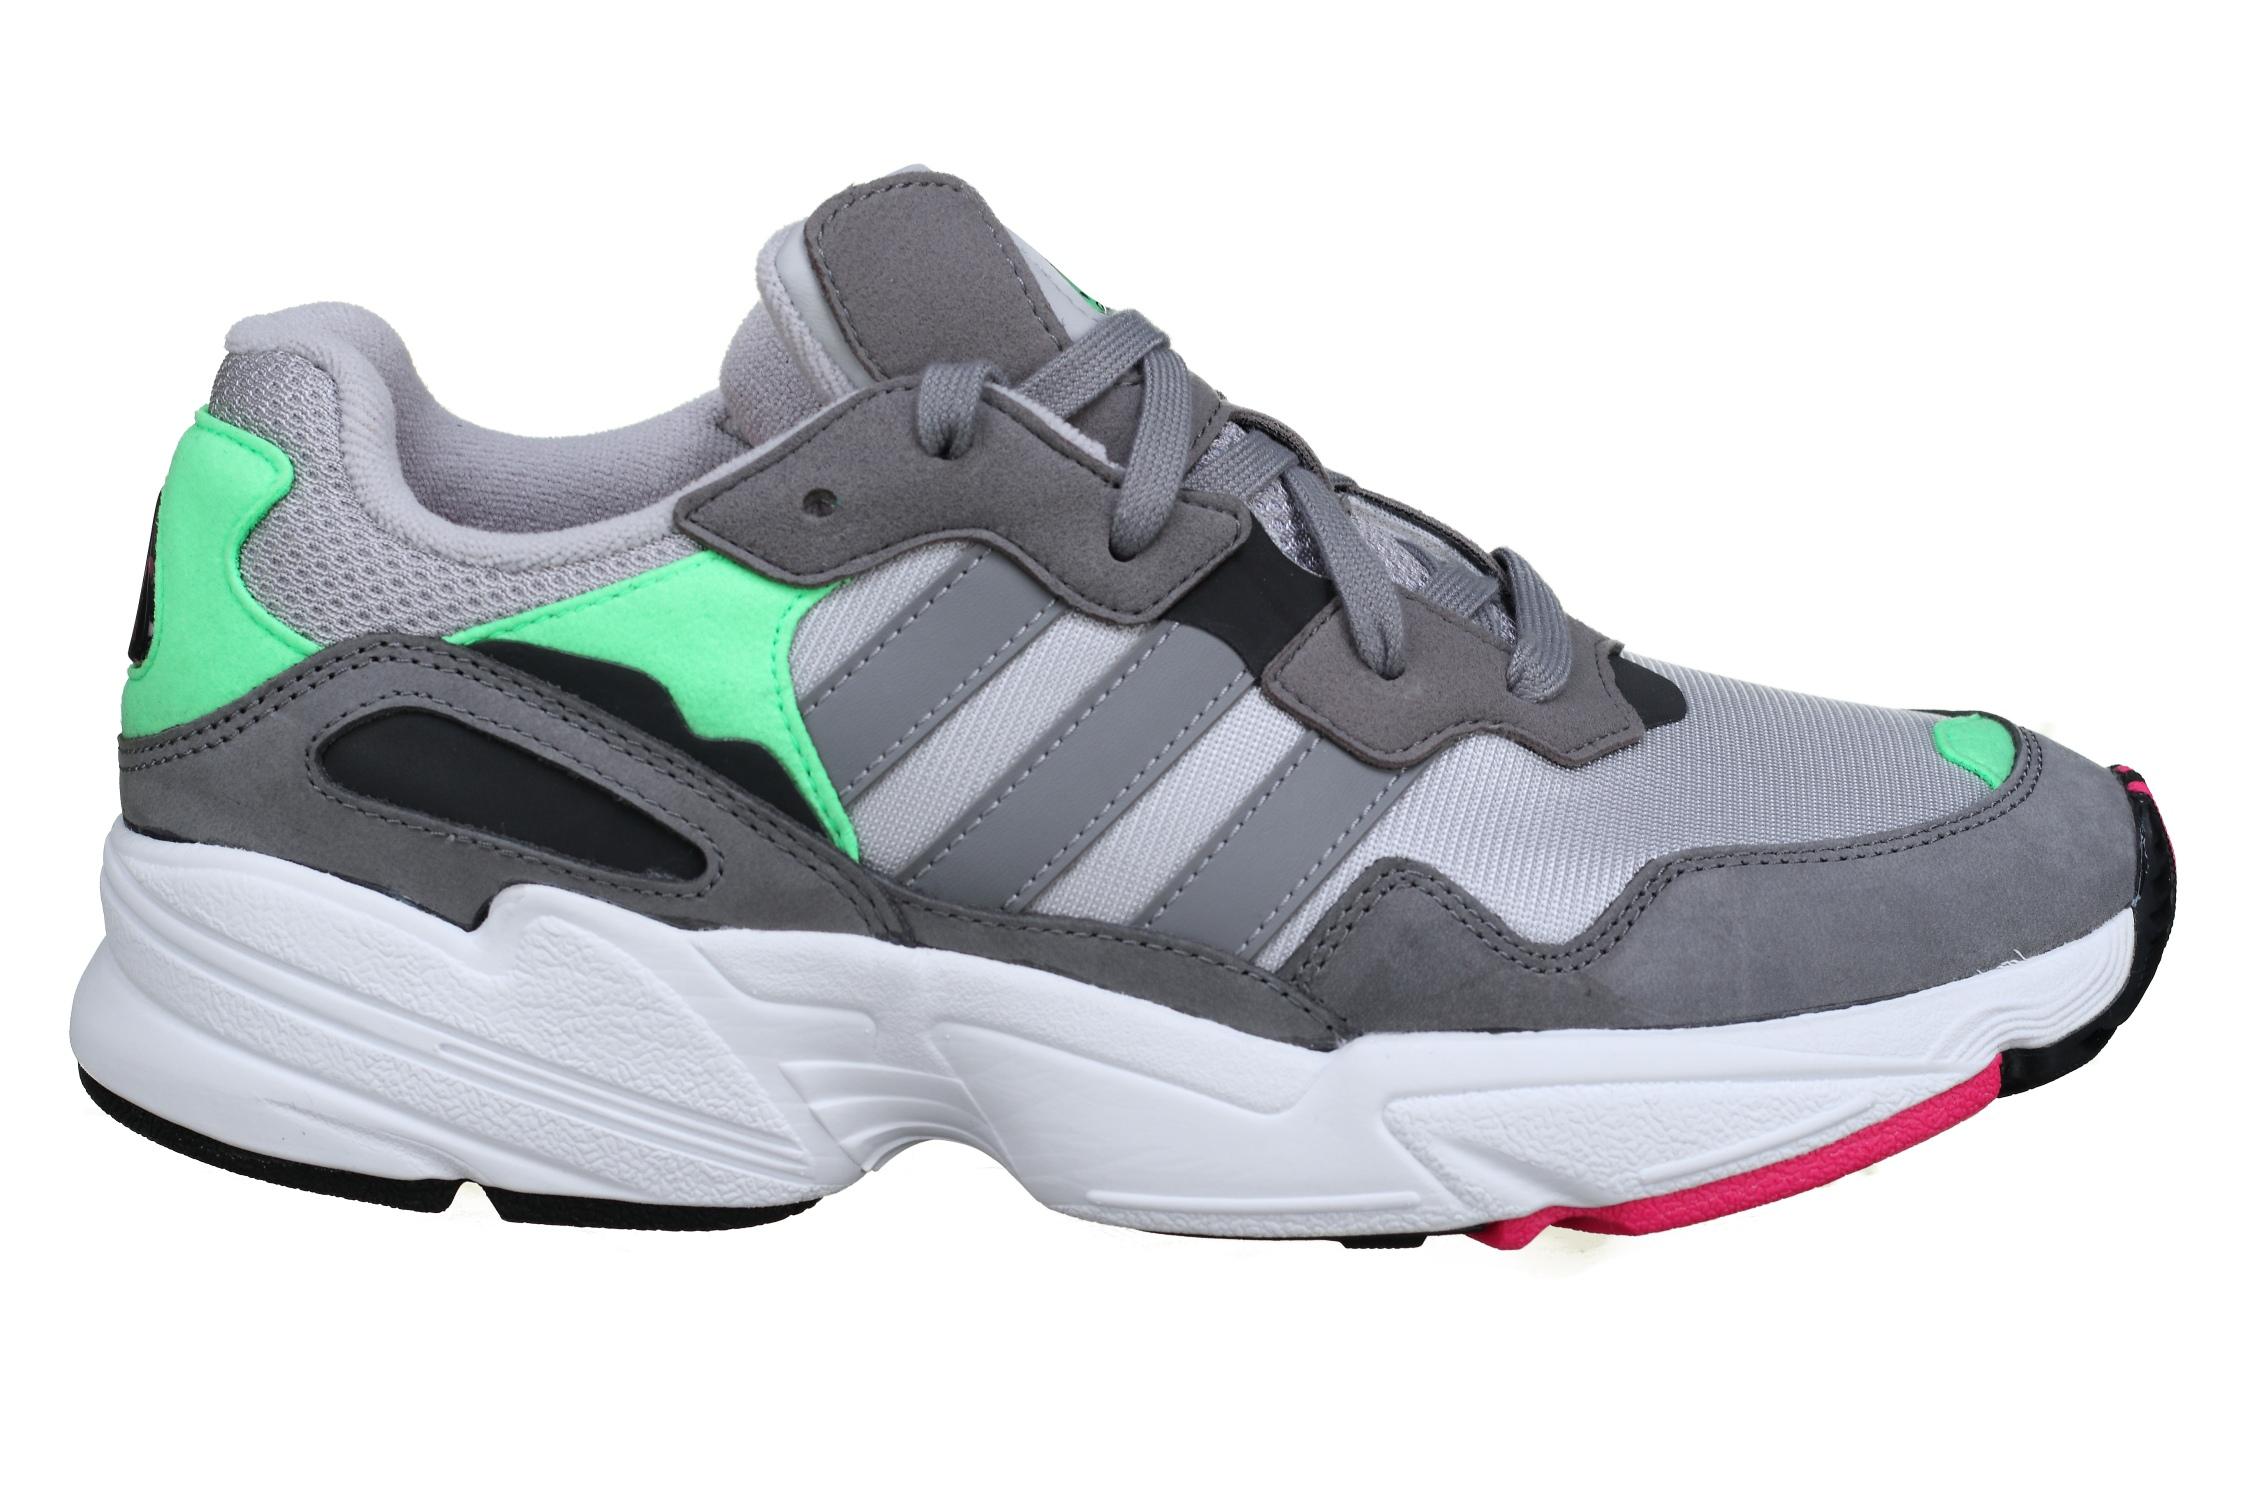 https://www.leadermode.com/162369/adidas-yung-96-f35020-gris.jpg